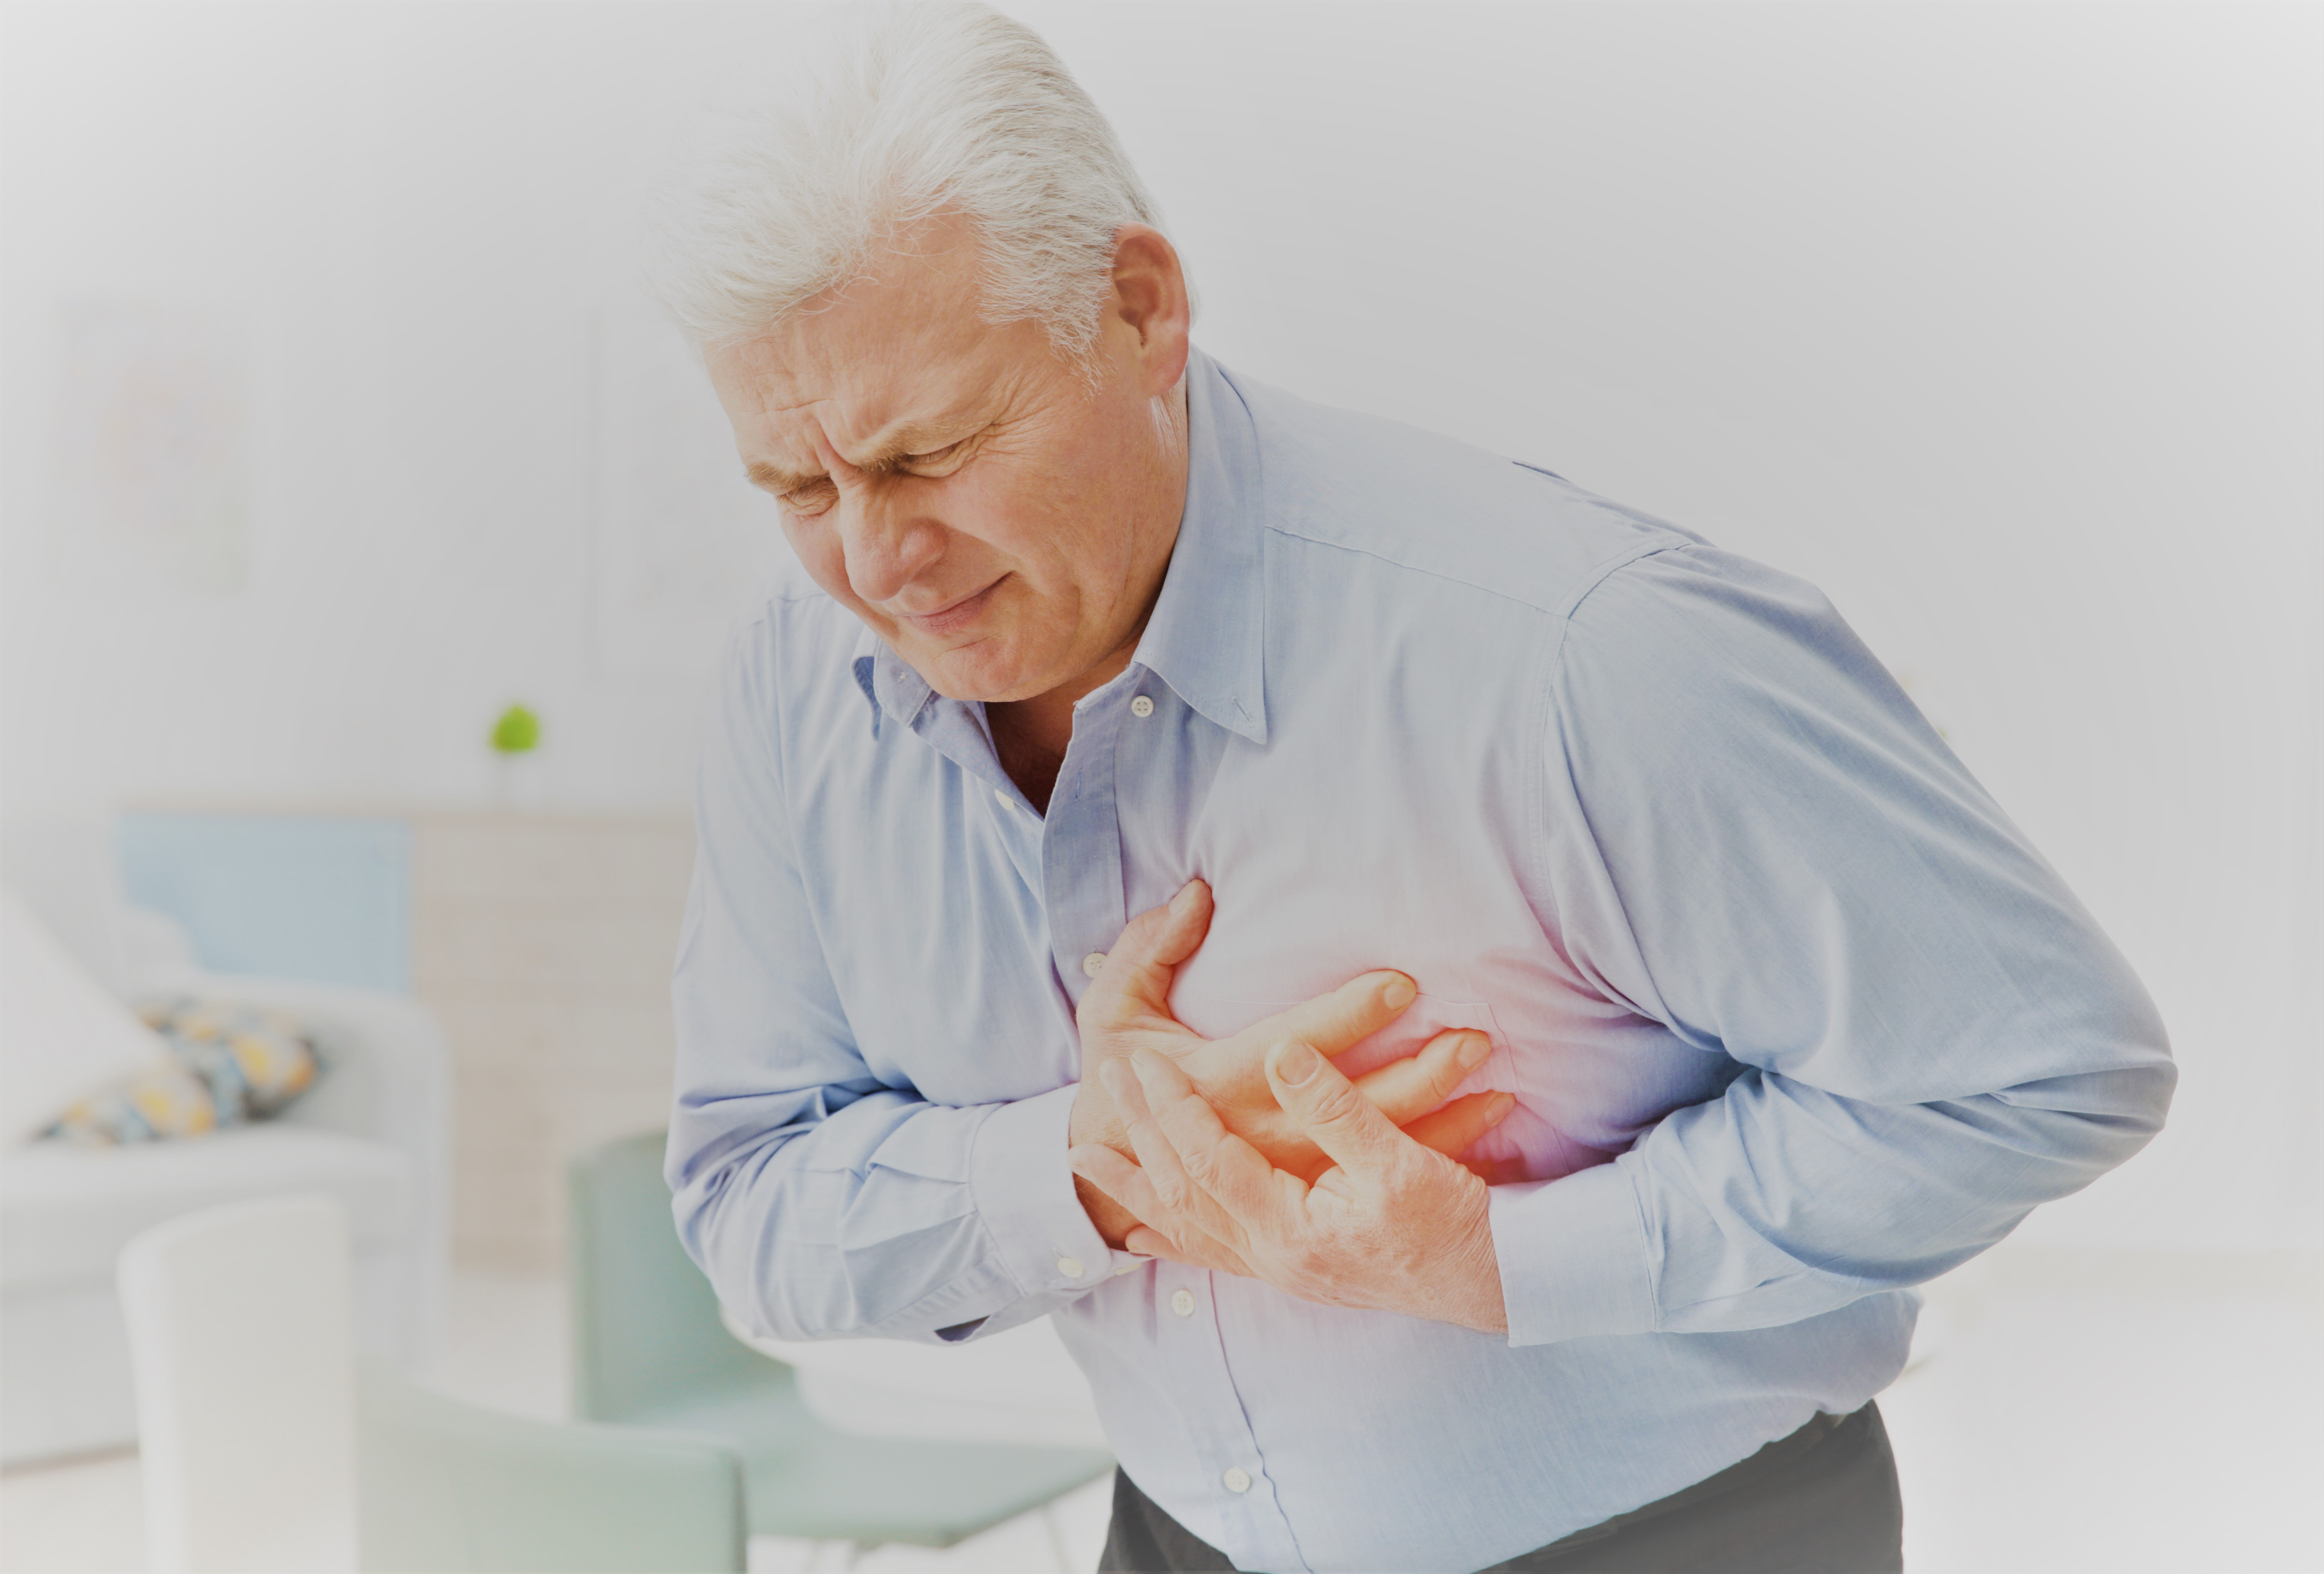 Mellkasi fájdalom, magas vérnyomás